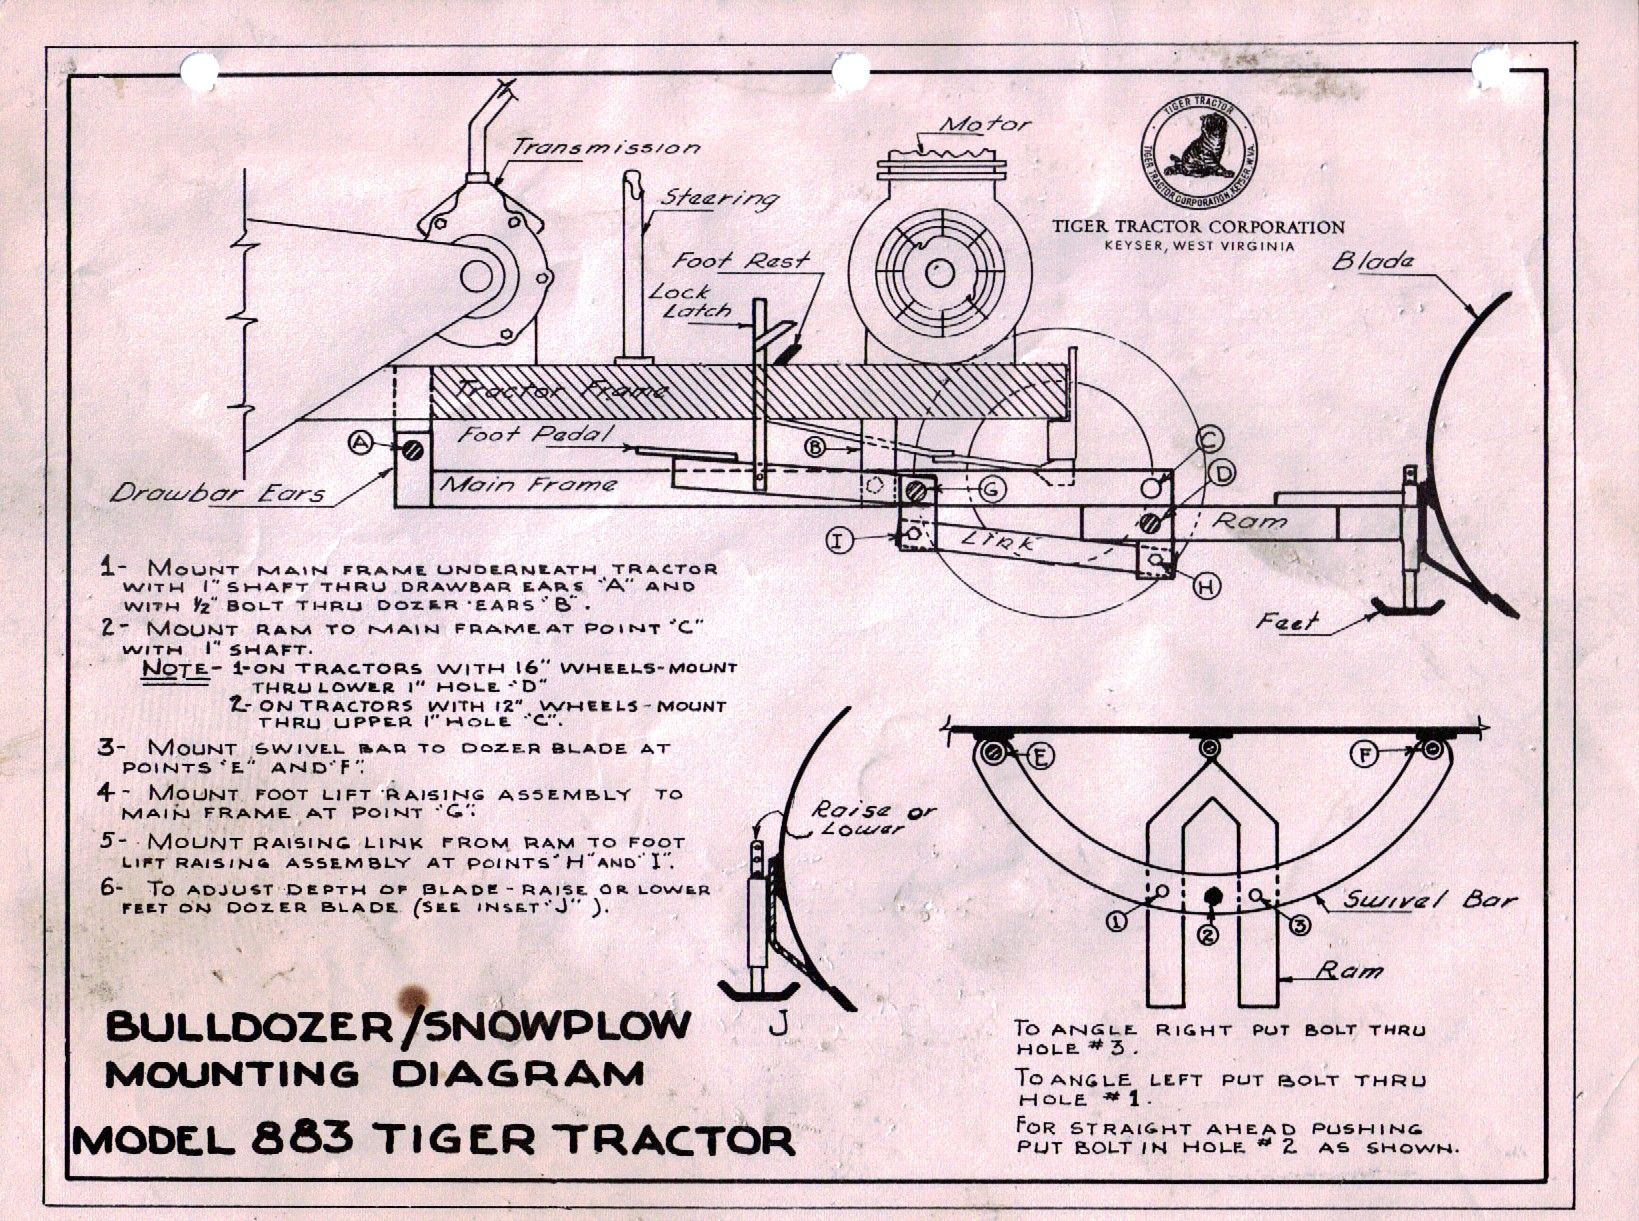 medium resolution of tiger bulldozer snowplow mounting diagram